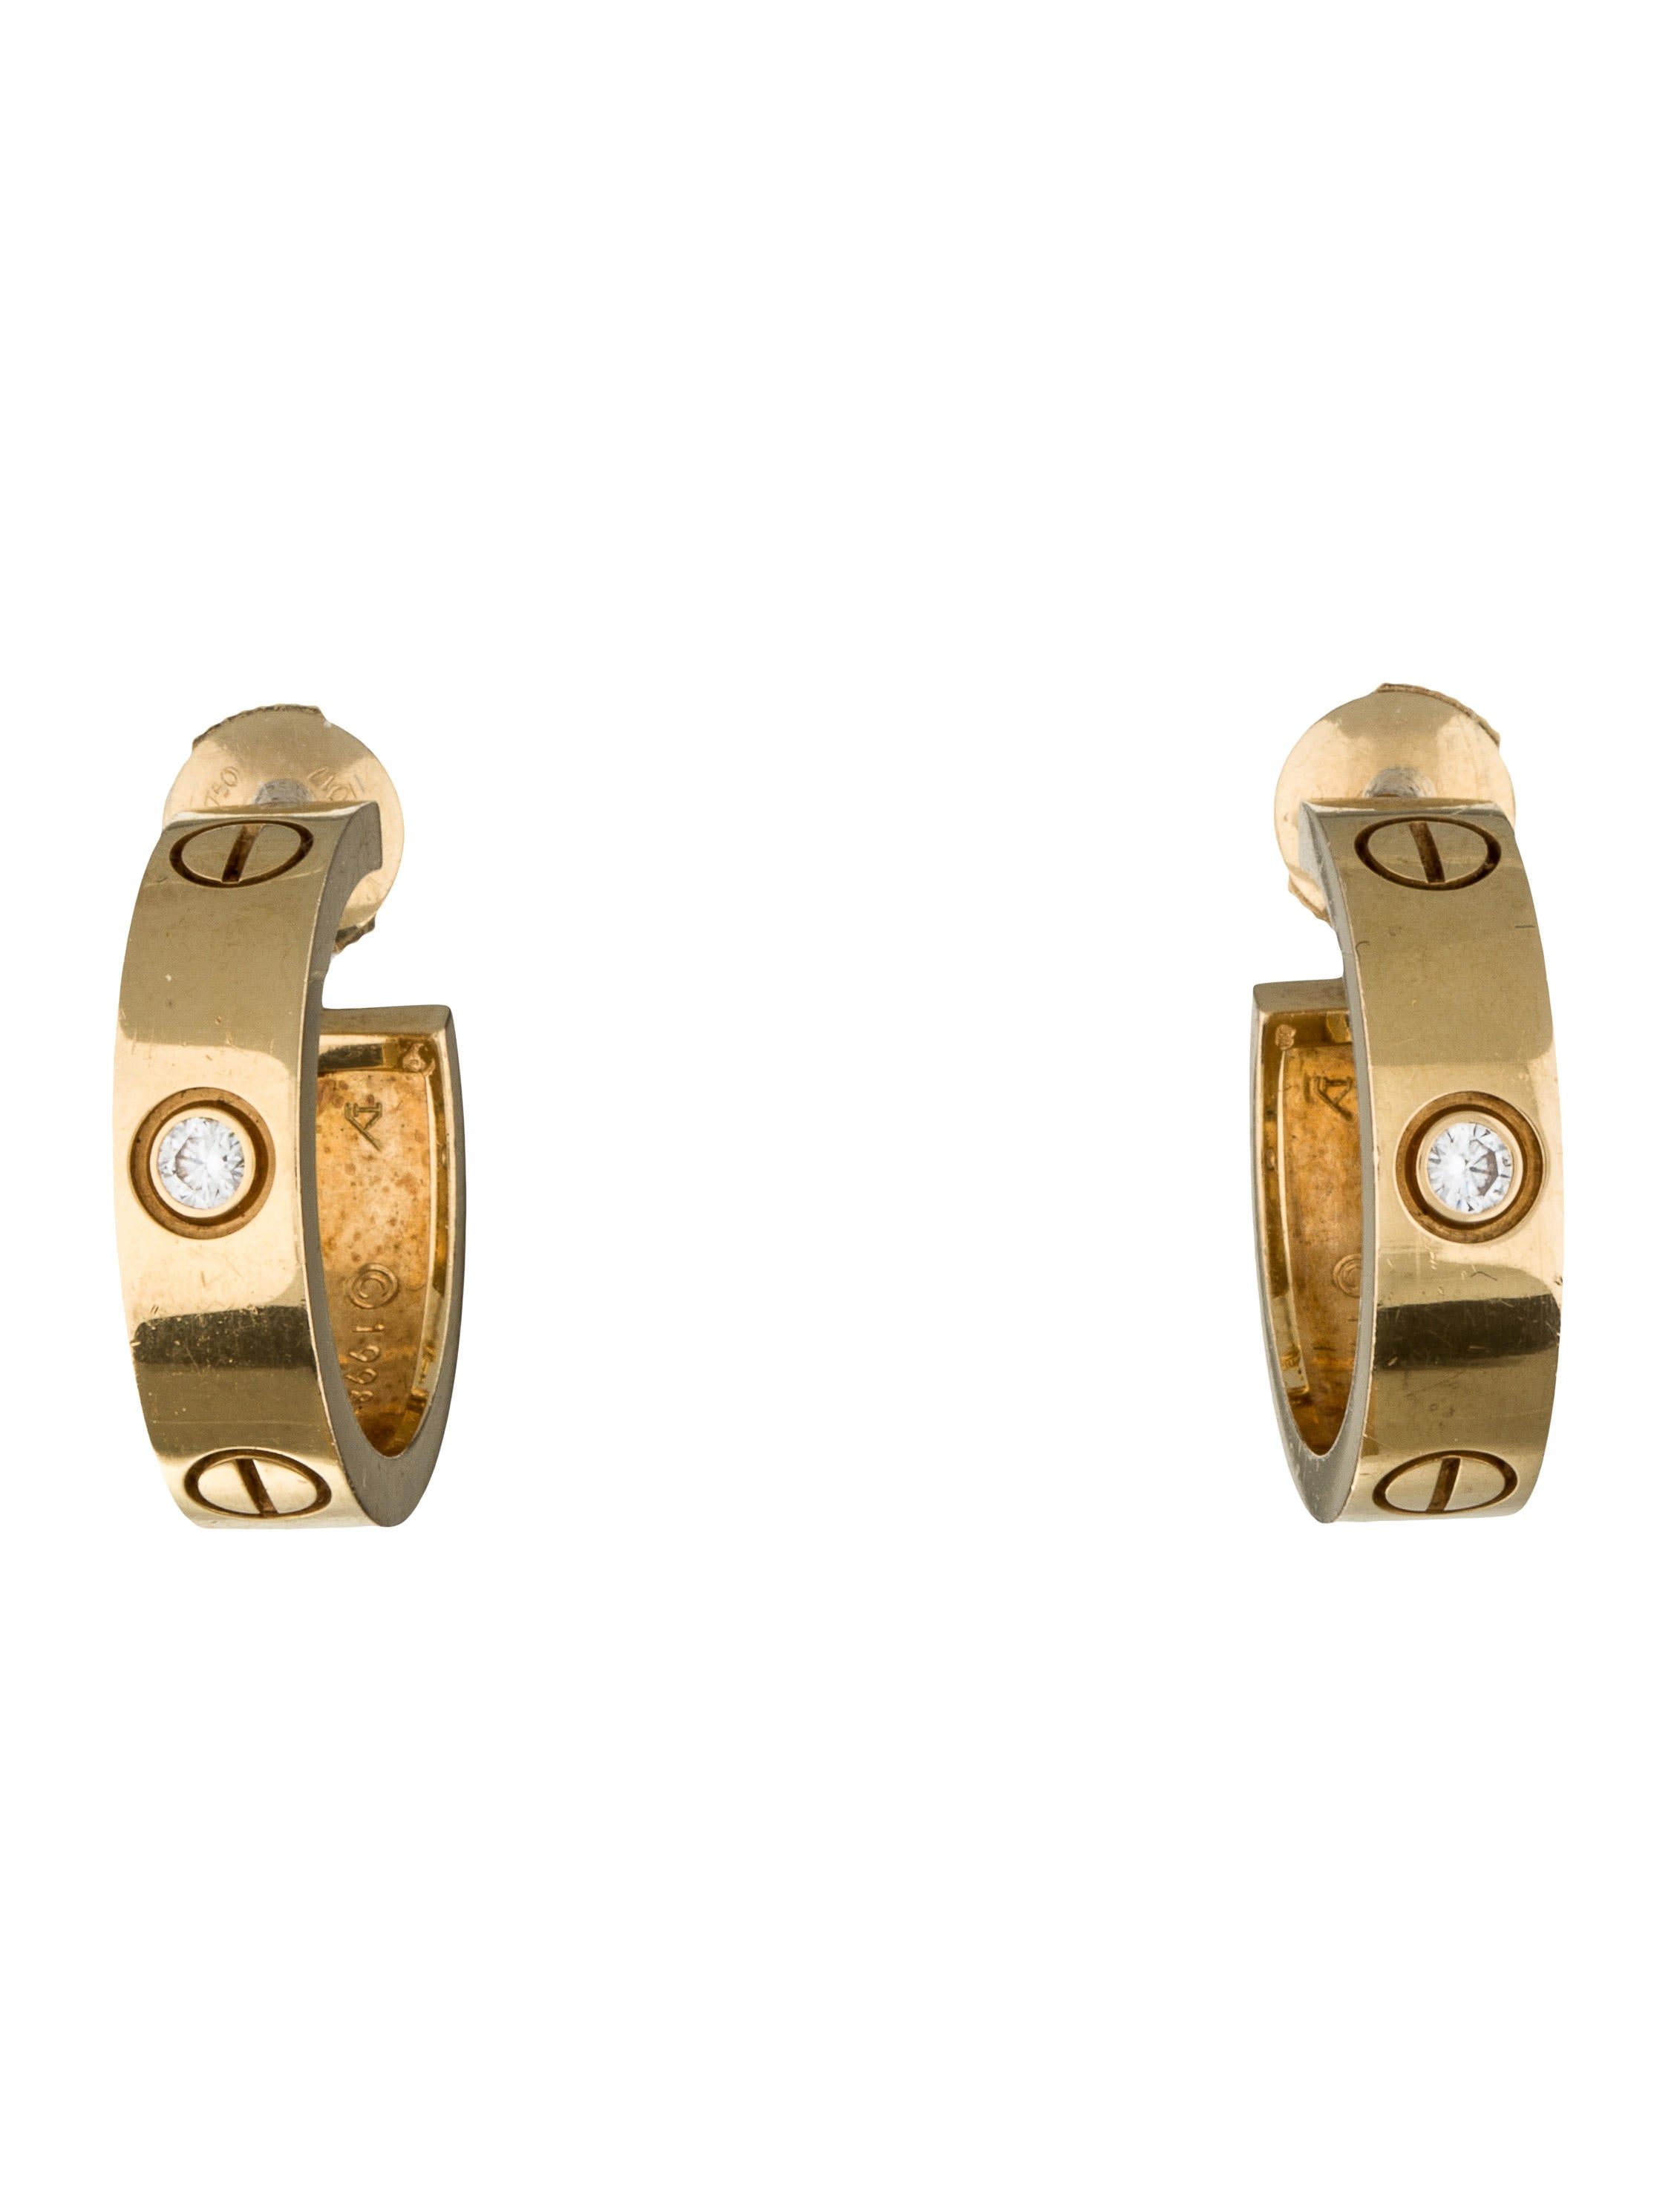 Cartier love bracelet  Etsy